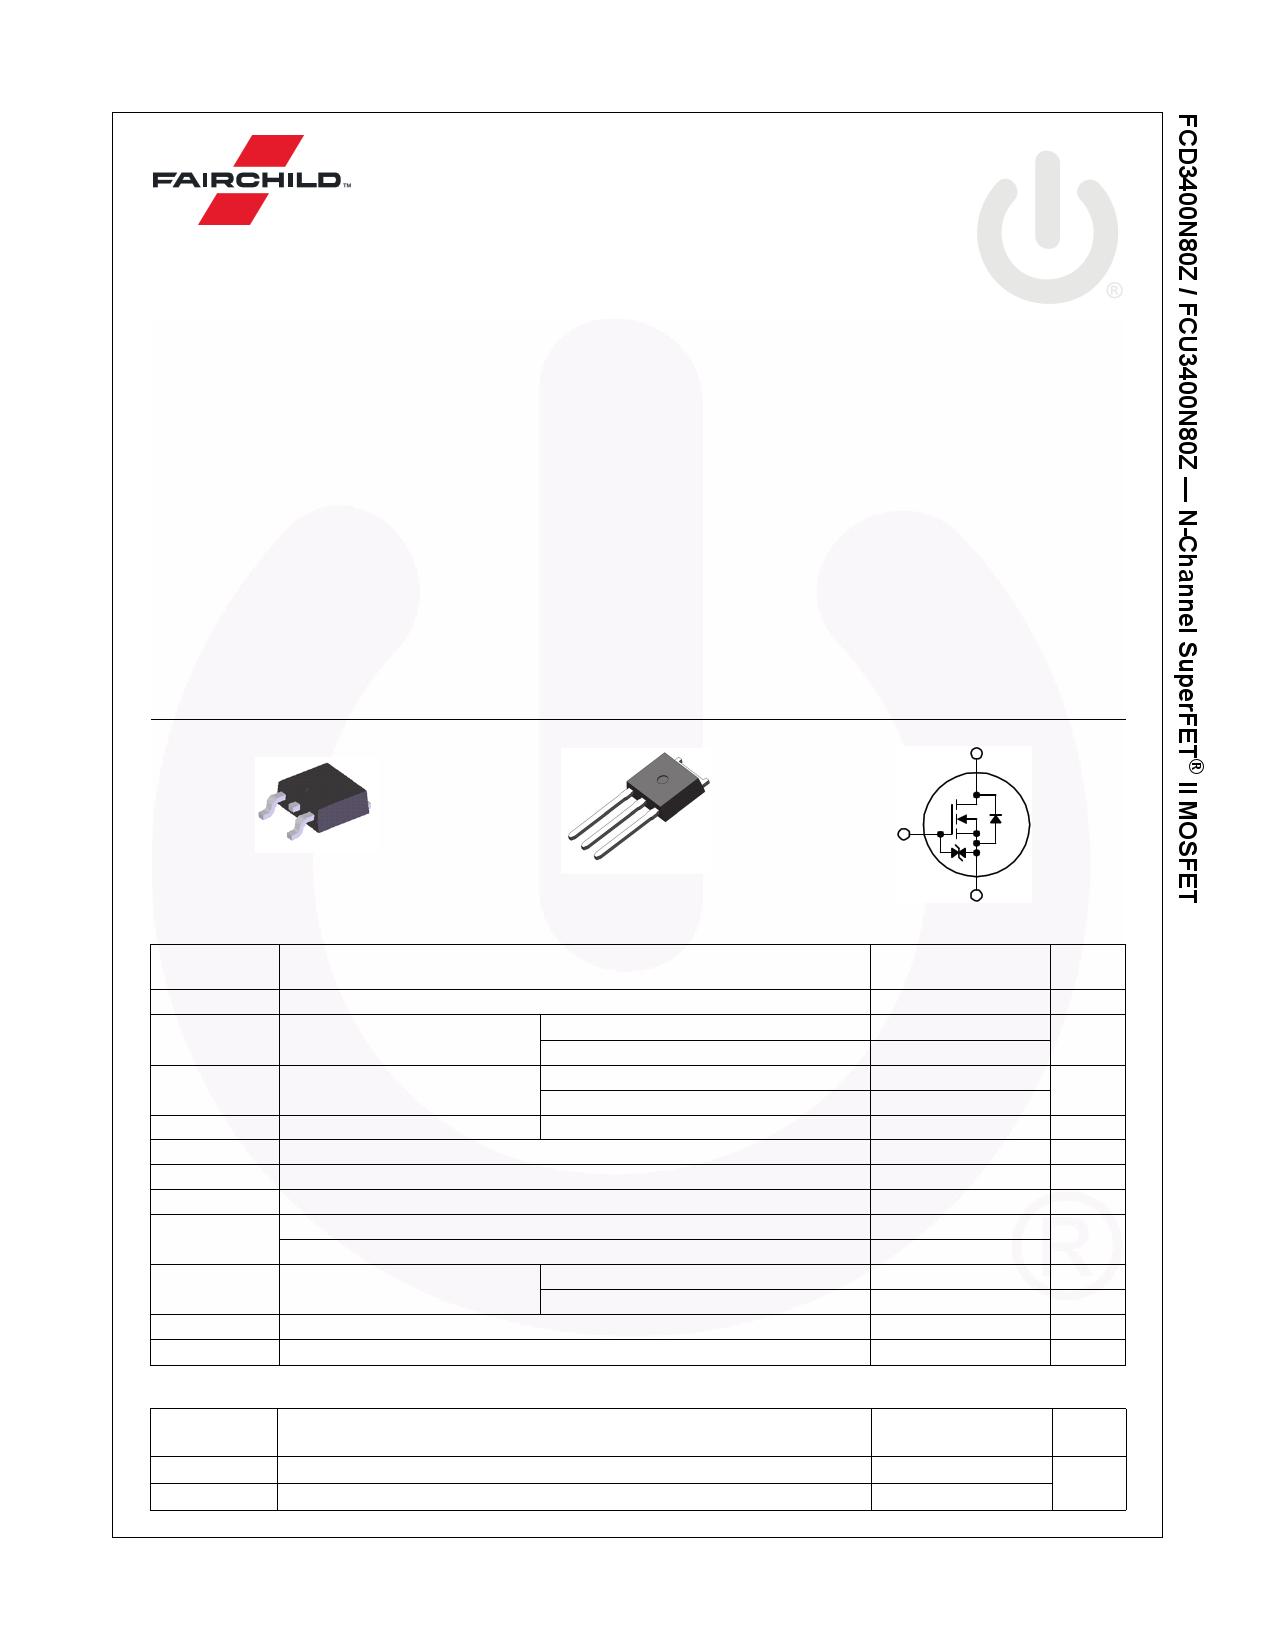 FCD3400N80Z datasheet